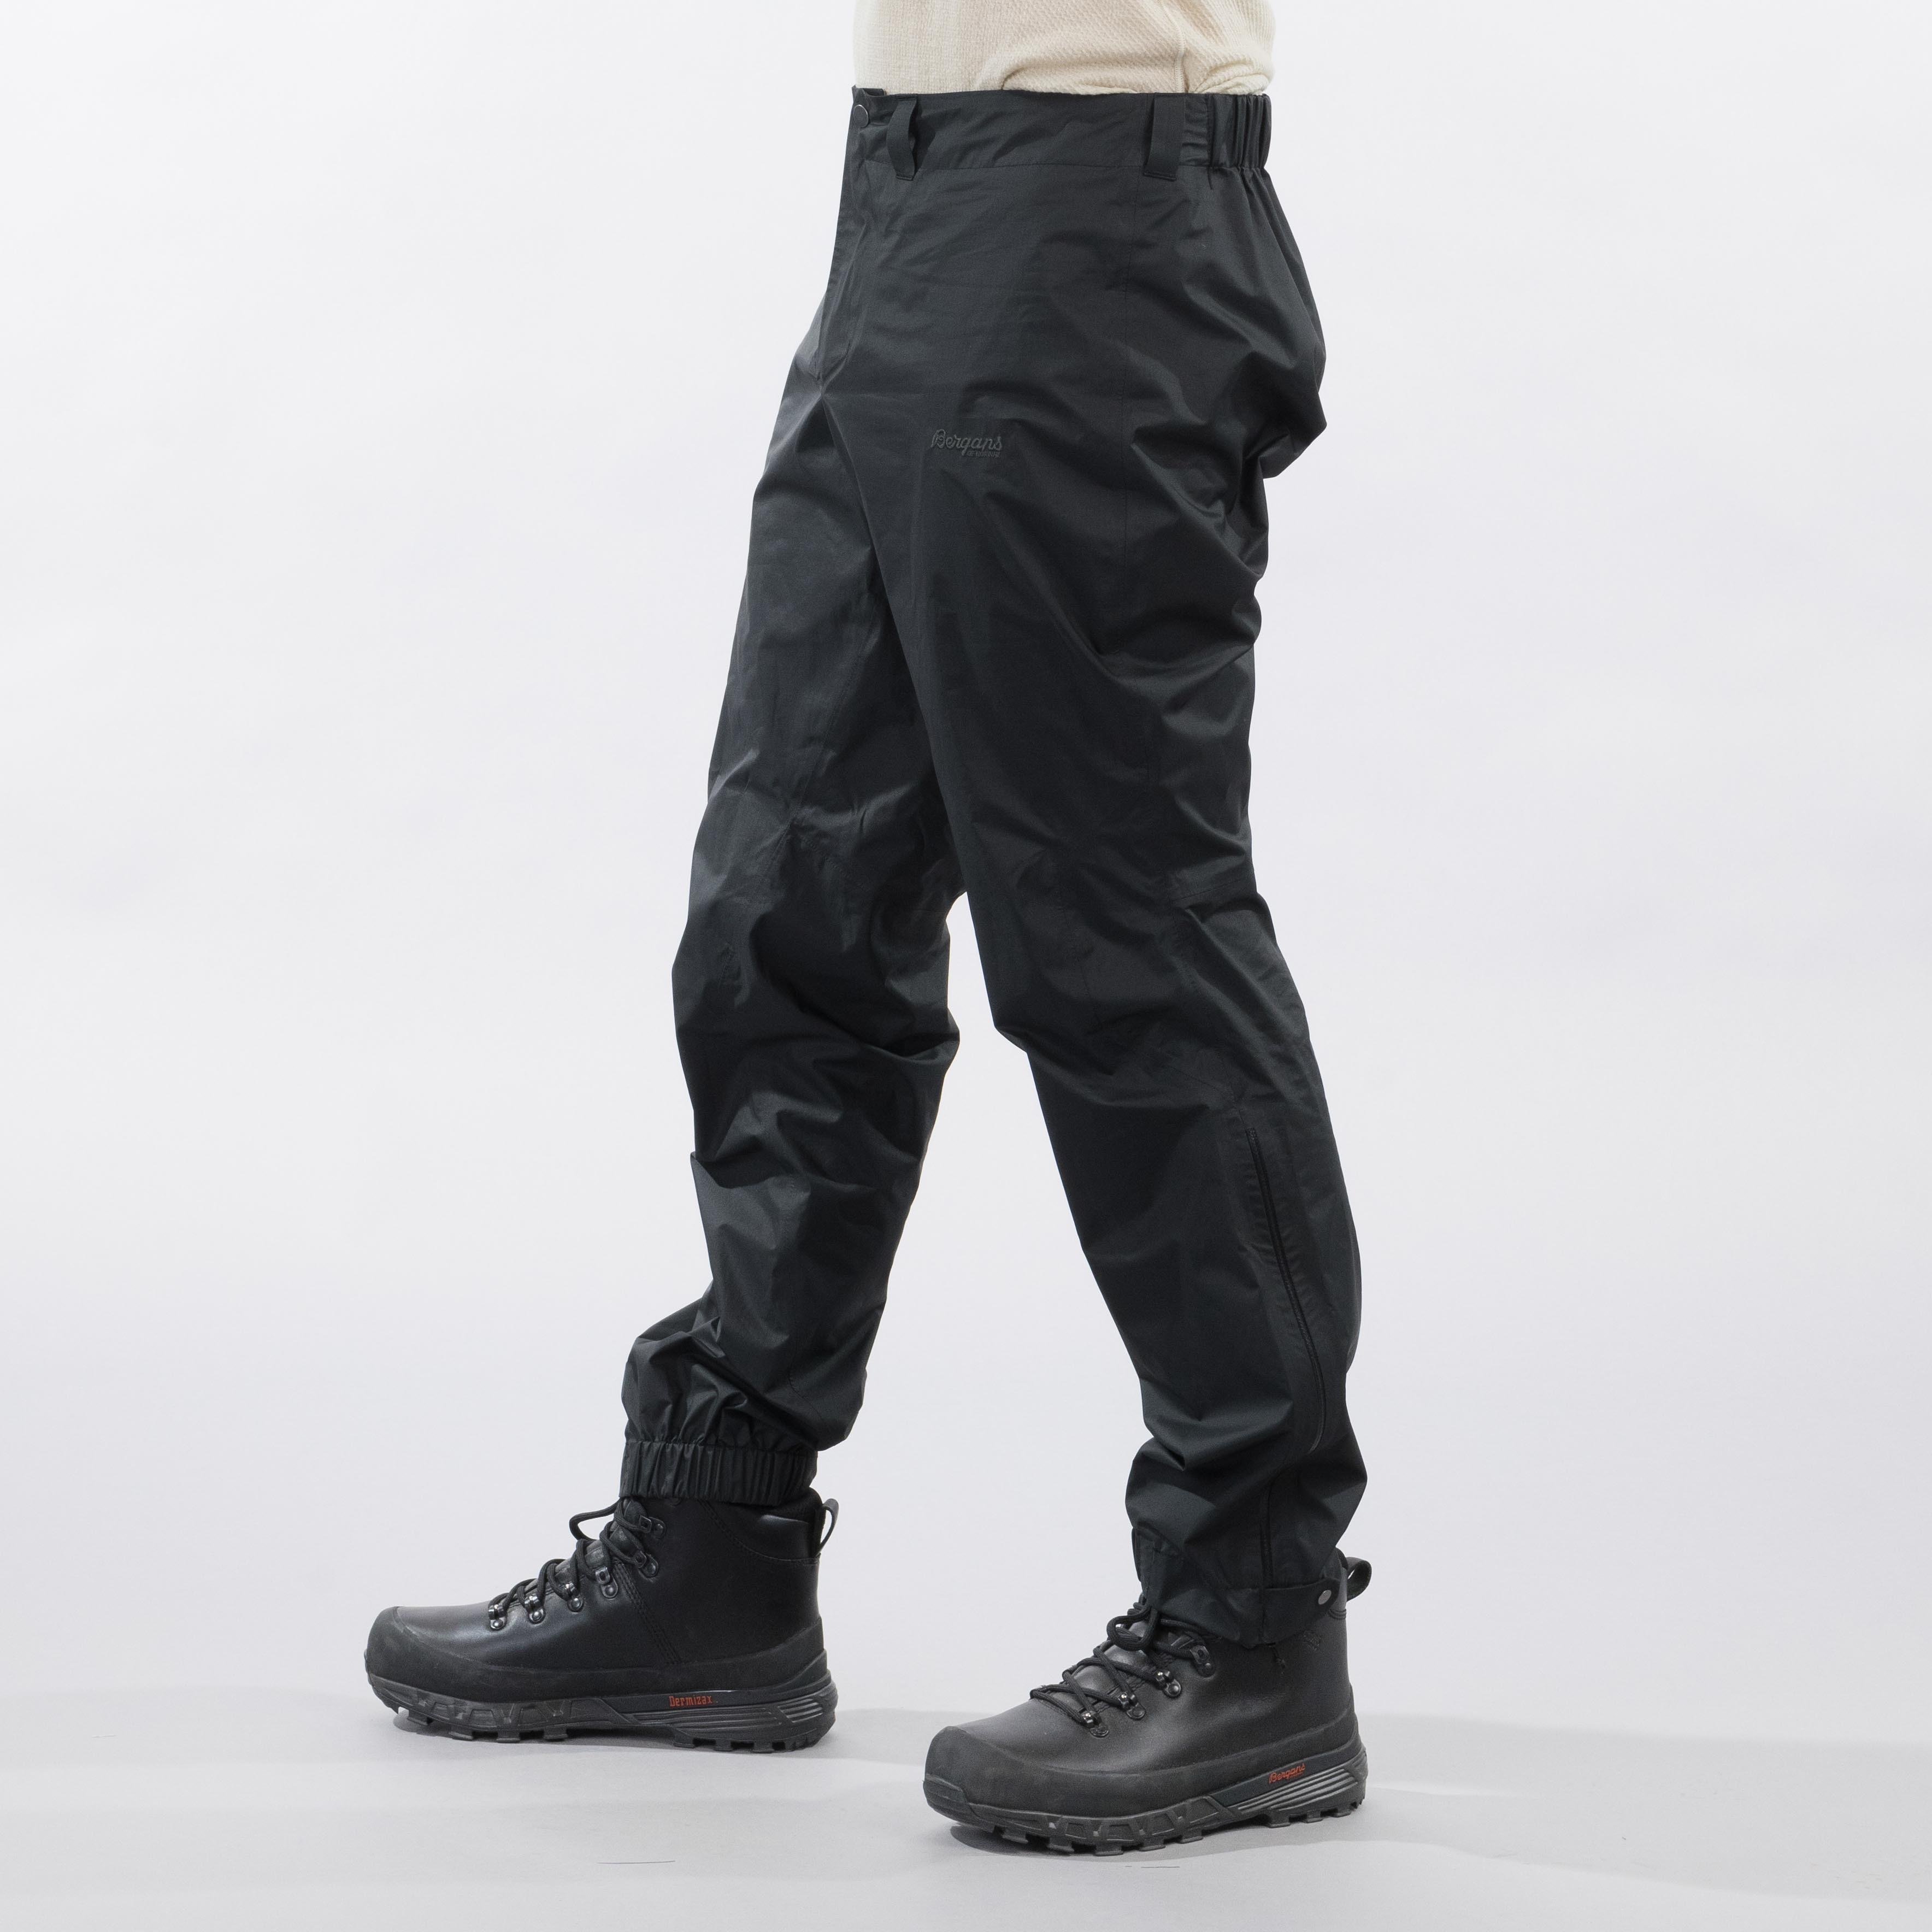 Vatne 3L Pants